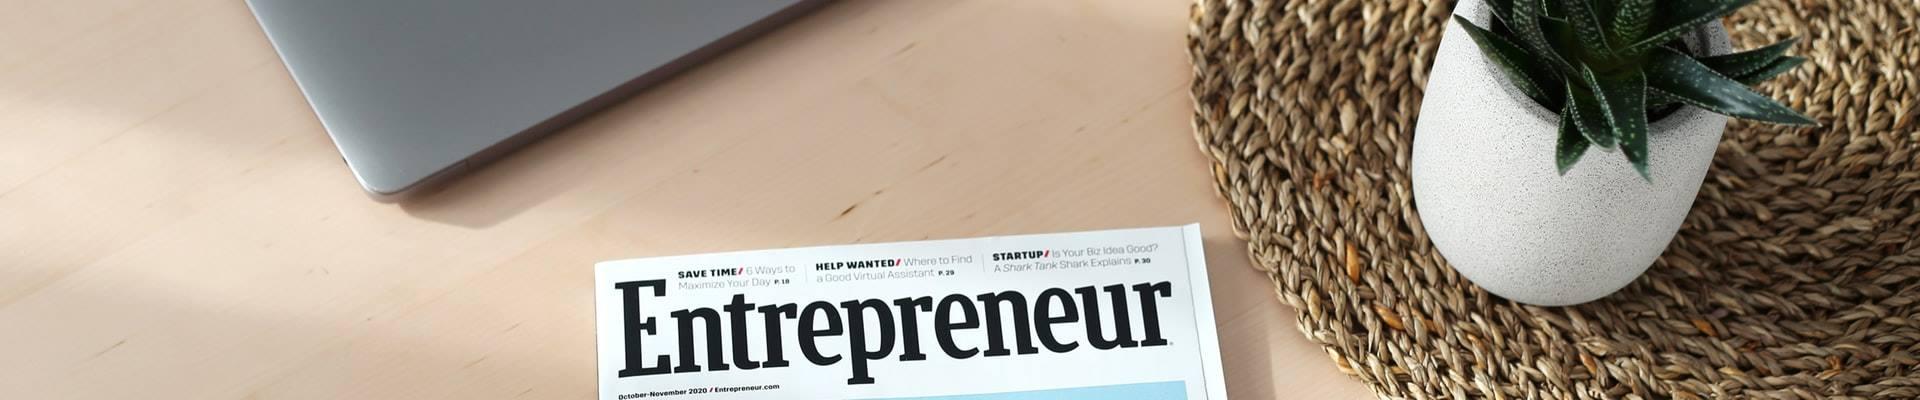 Entrepeneur magazine on a desk